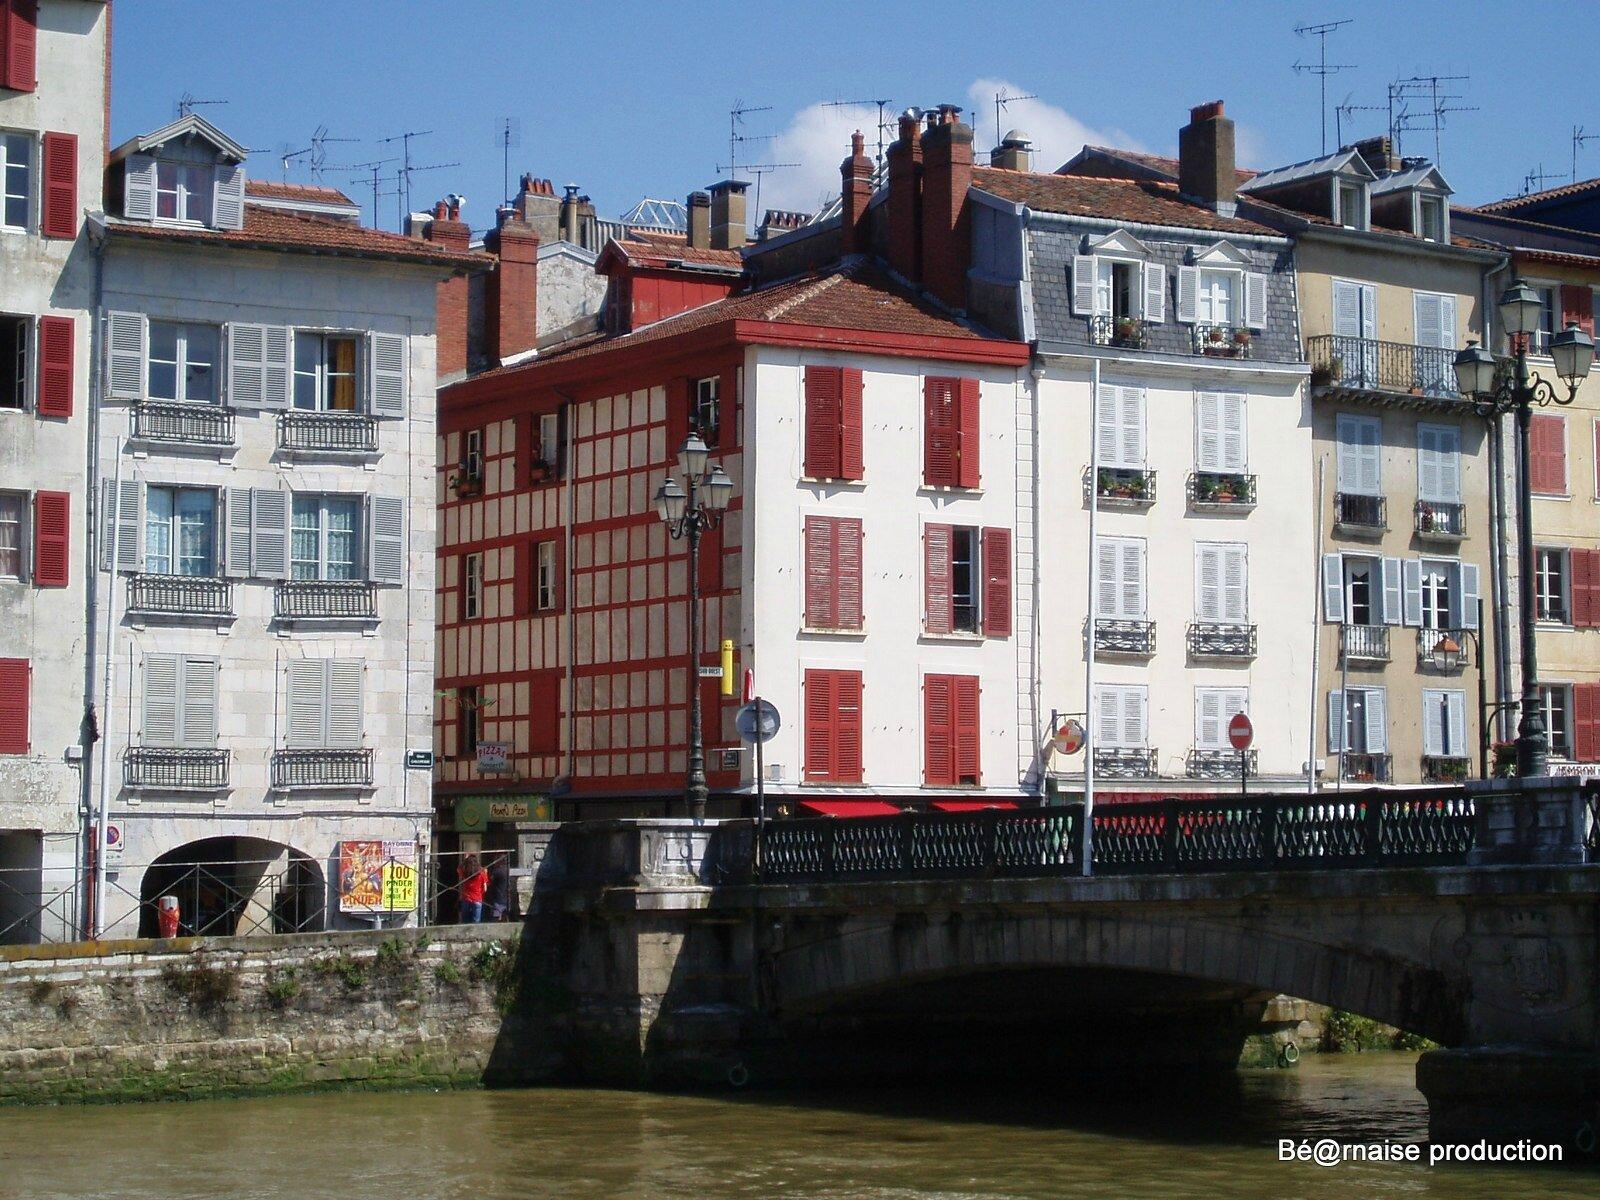 Rouge basque (Bayonne, août 2008)